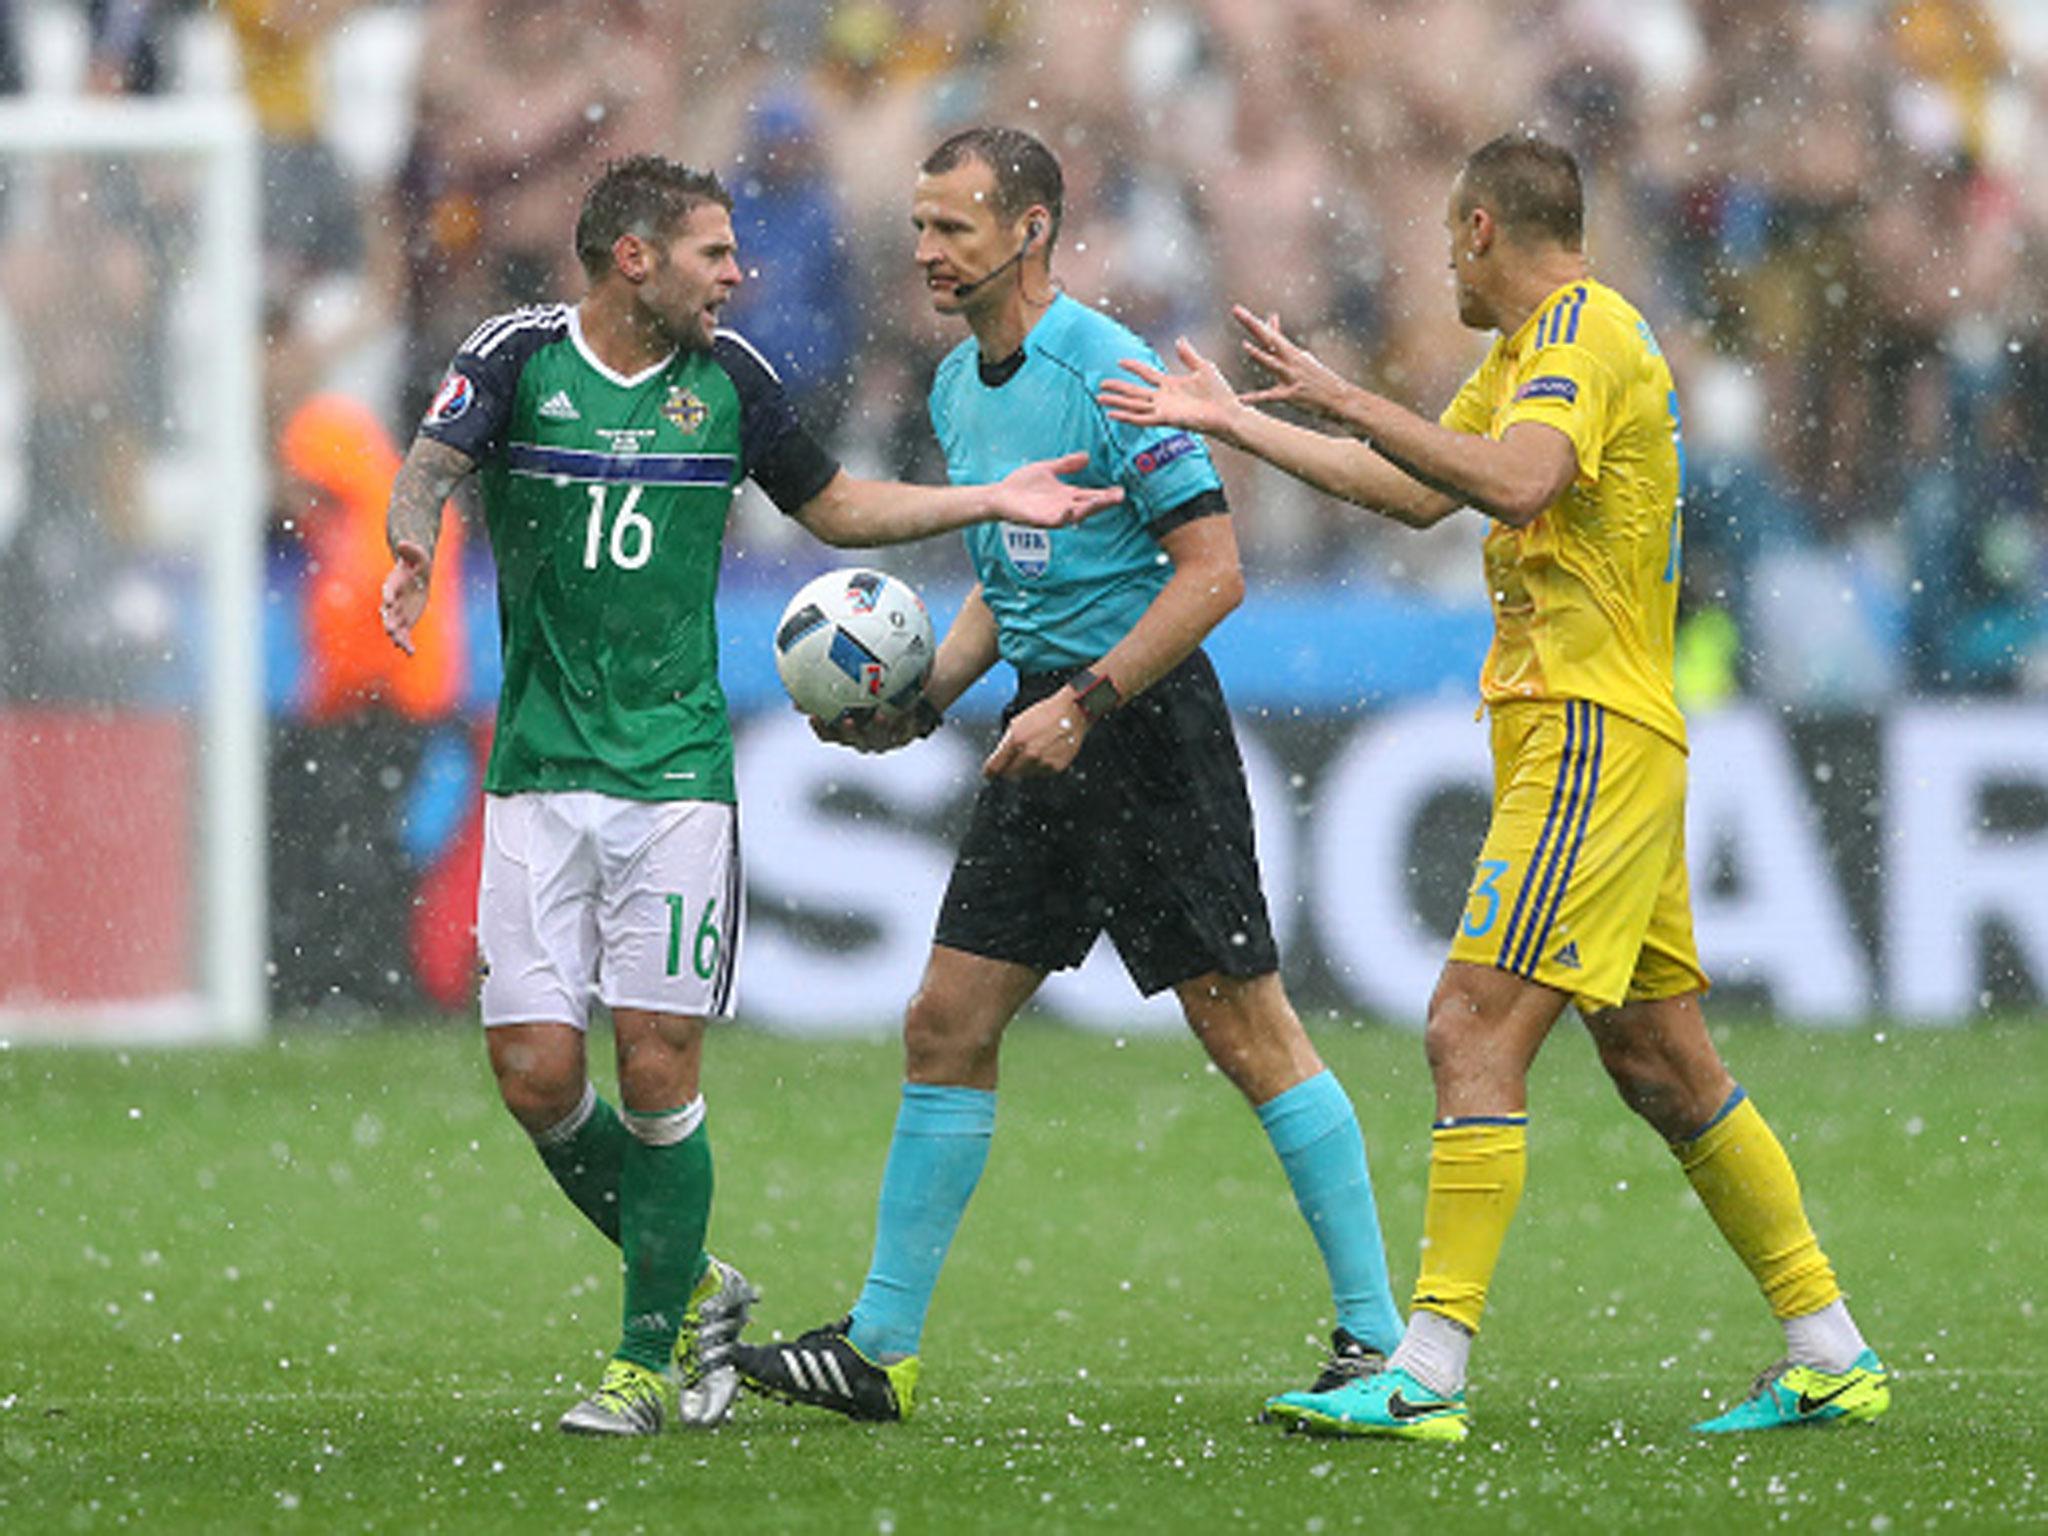 Ukraine vs Northern Ireland at Euro 2016 halted due to heavy rain 2048x1536